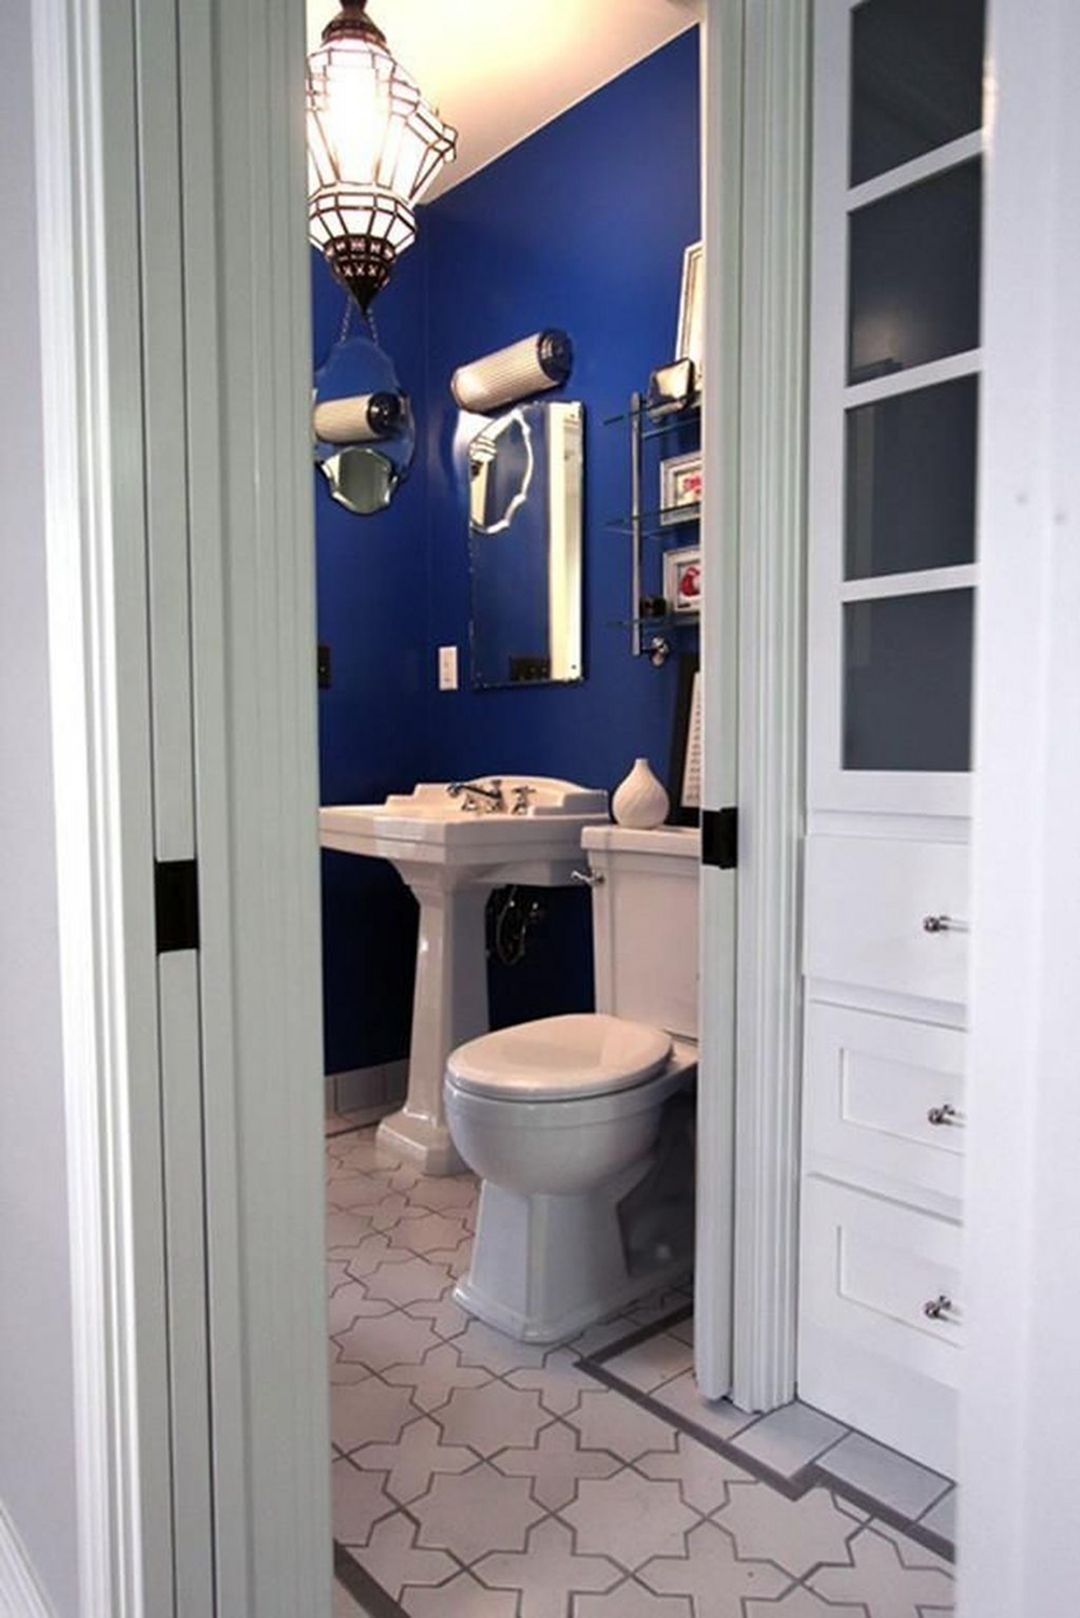 Great Idea Gorgeous 25 Most Bright Bathroom Paint Color Ideas Trend 2018 Https Goodsgn Com Bathroom Blue Bathroom Walls Bathroom Styling Royal Blue Bathrooms